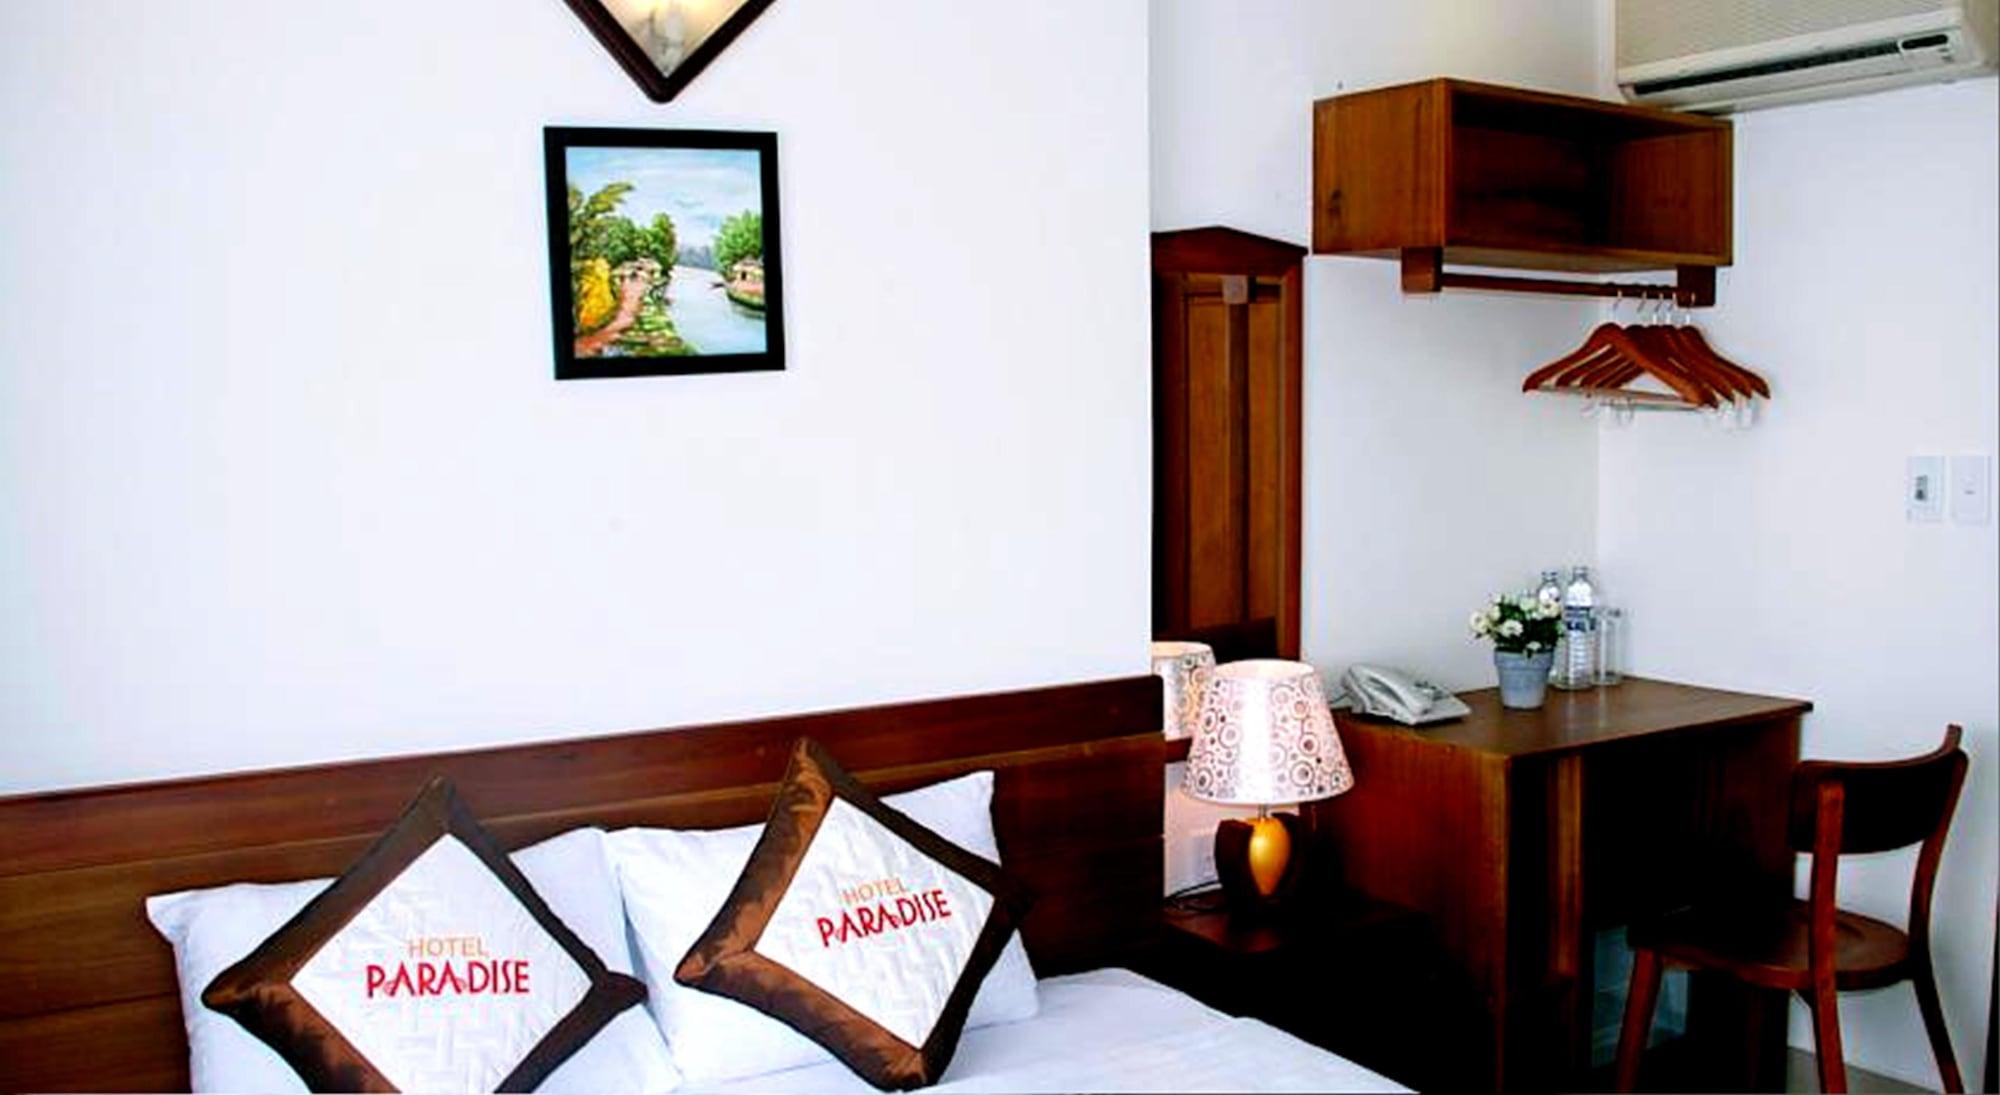 Paradise Hotel, Hải Châu